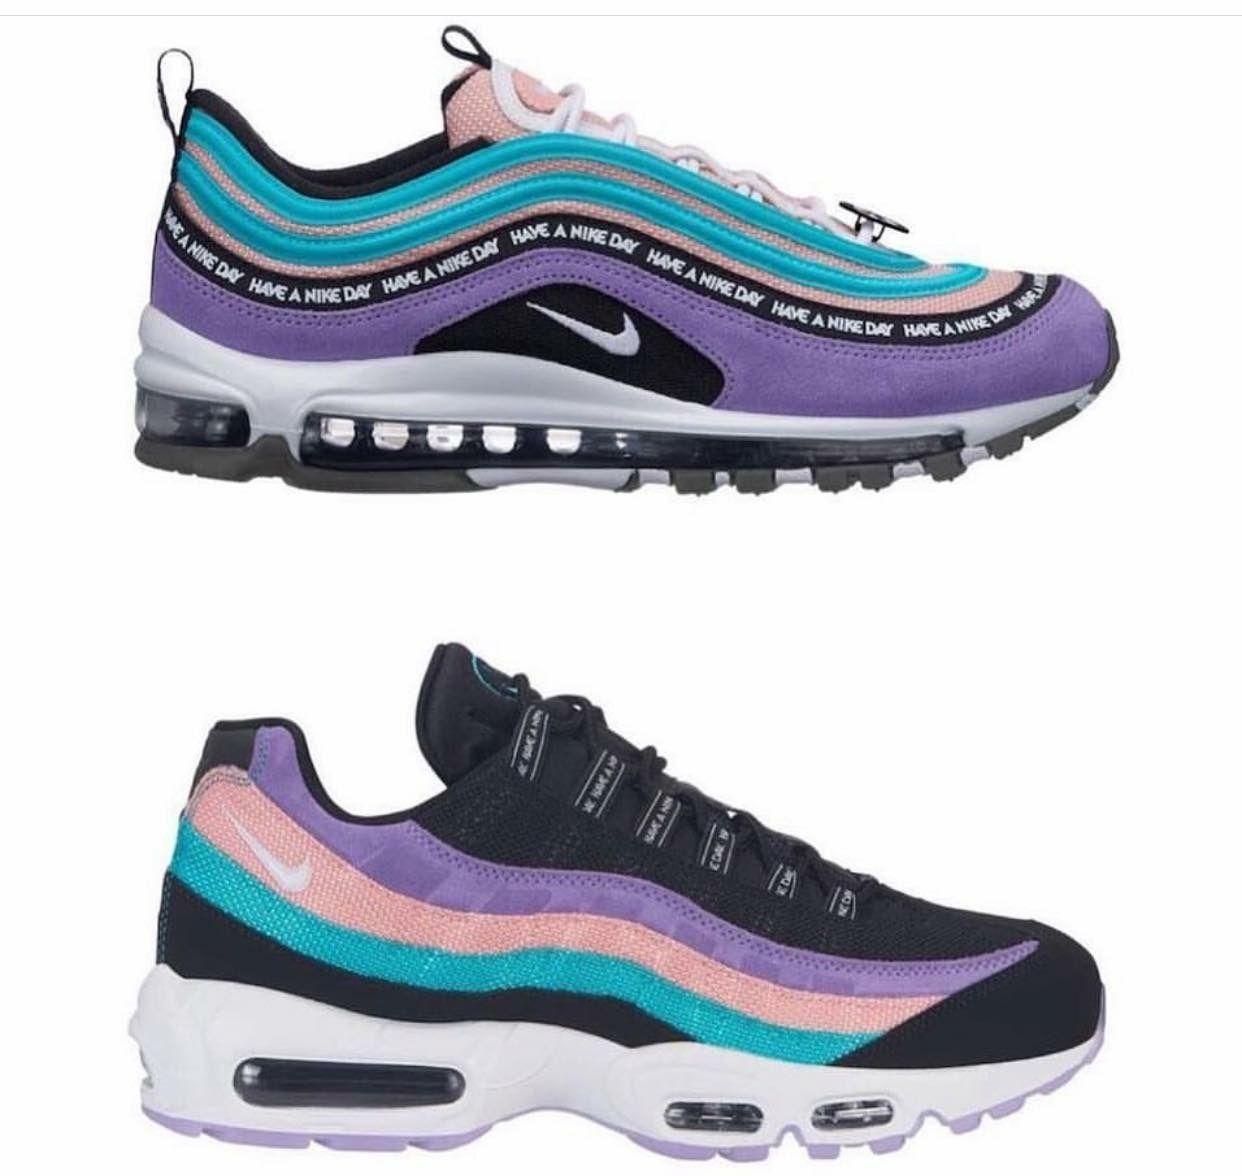 83791cf3b6ea On Nike Junfeichen Pin Pinterest Max Nike Shoes Air 97 By UO7nqwqWH